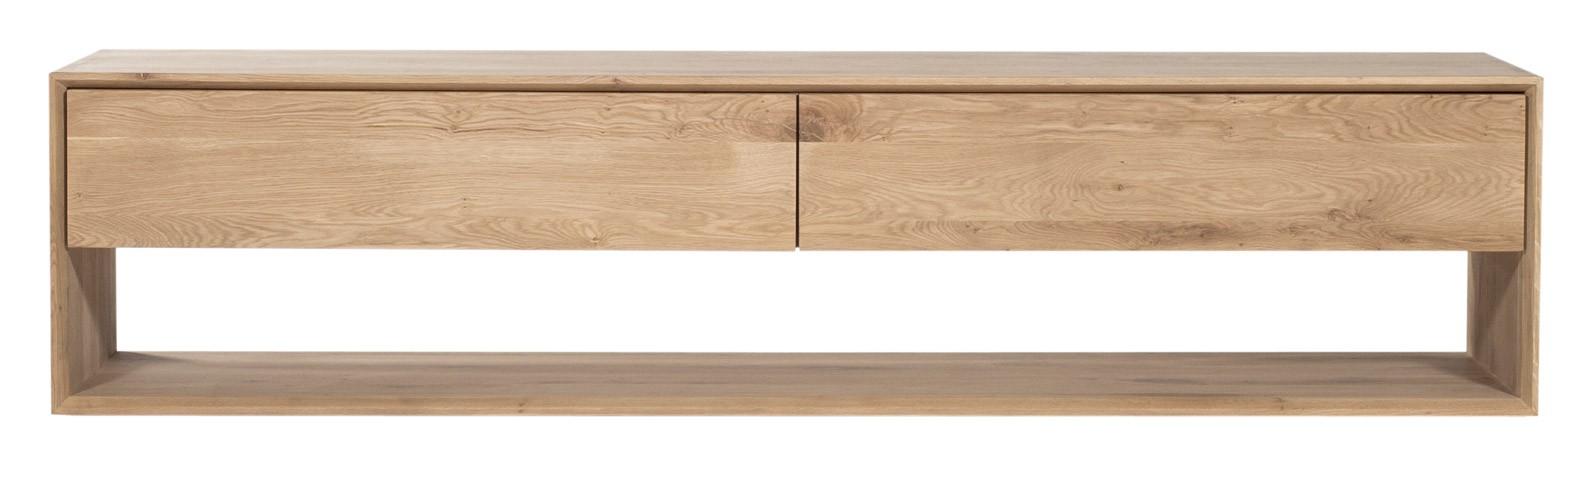 meuble tv oak nordic d 39 ethnicraft 1 porte abattante 1 tiroir. Black Bedroom Furniture Sets. Home Design Ideas